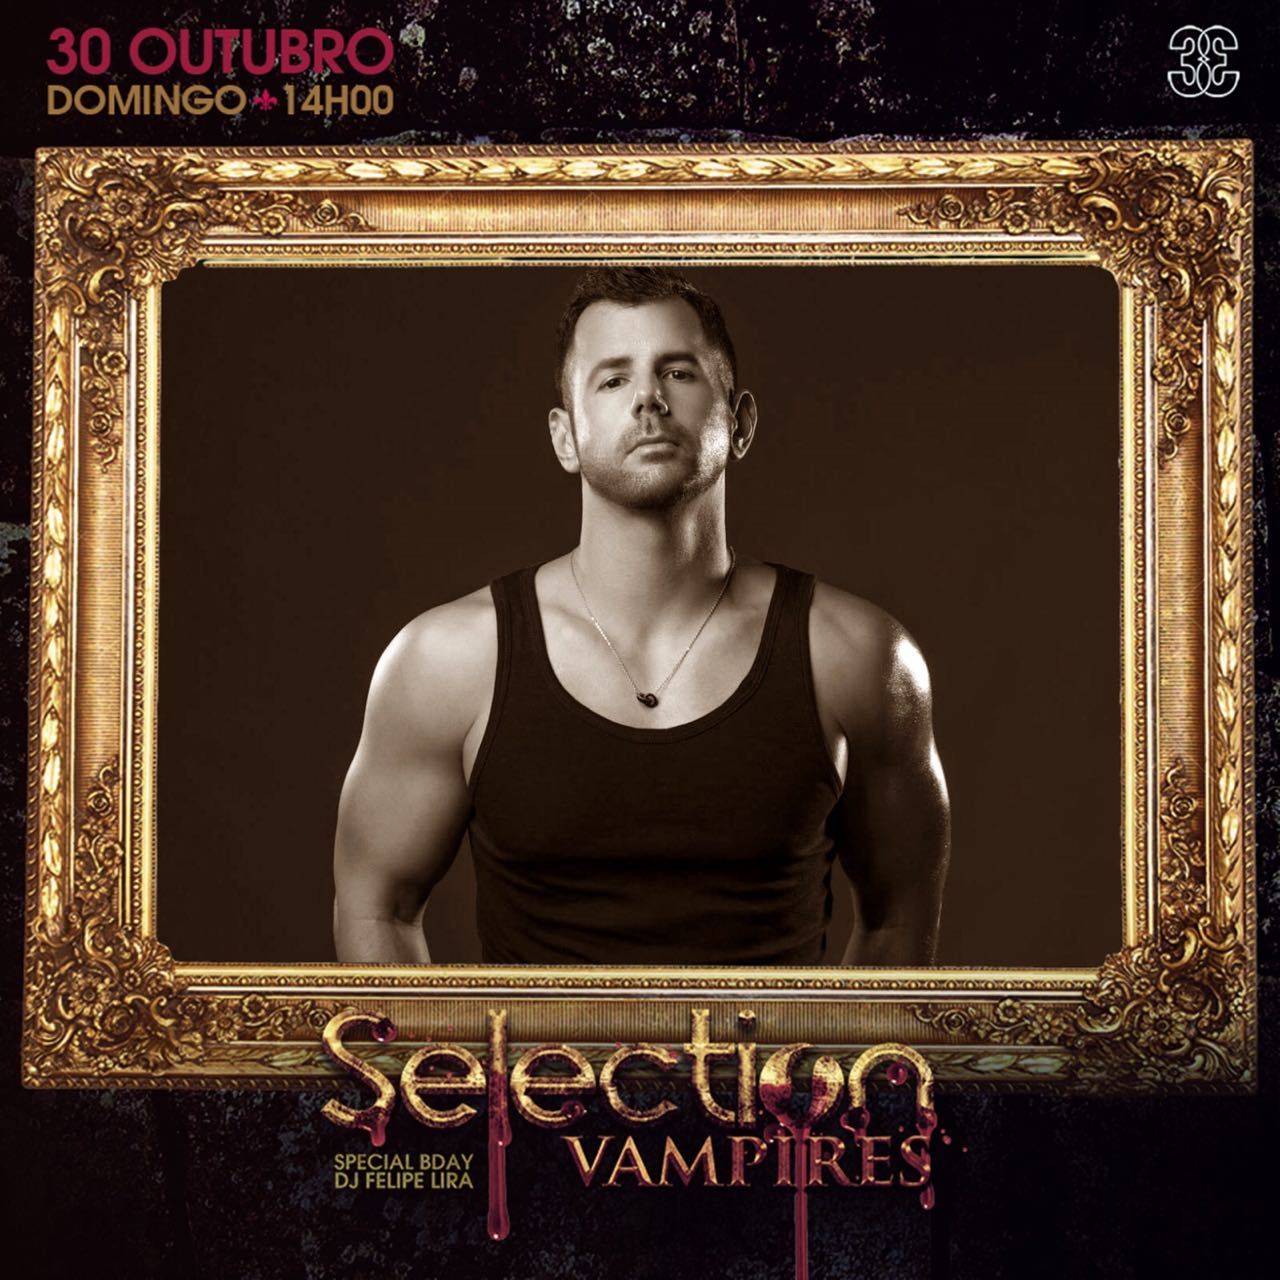 Selection vampire